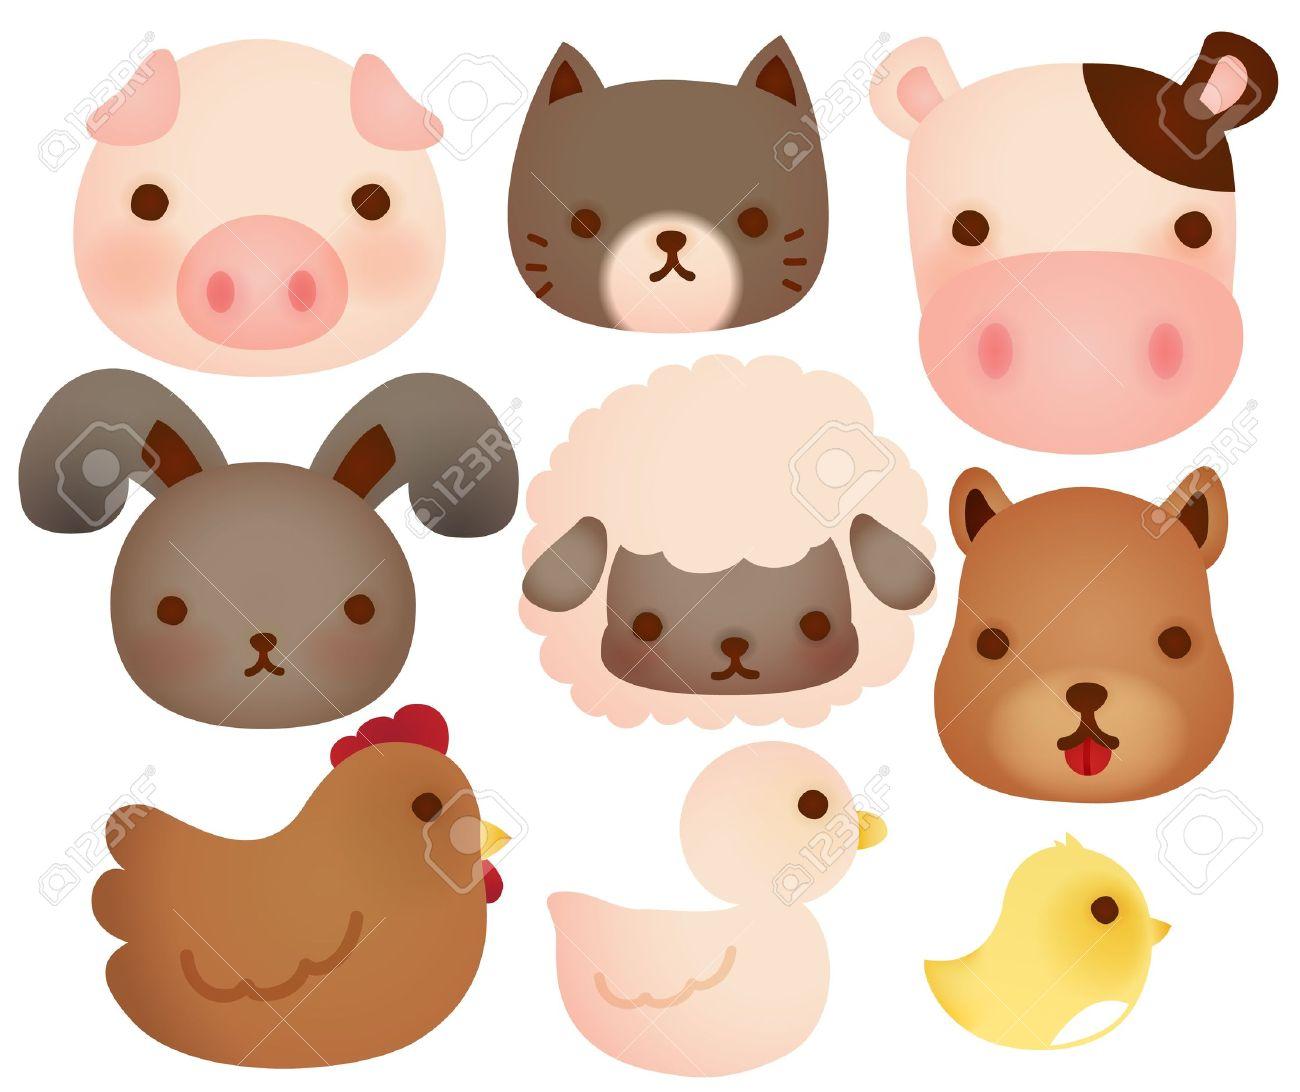 Baby Farm Animals Clip Art collection of cute farm animals royalty free cliparts, vectors